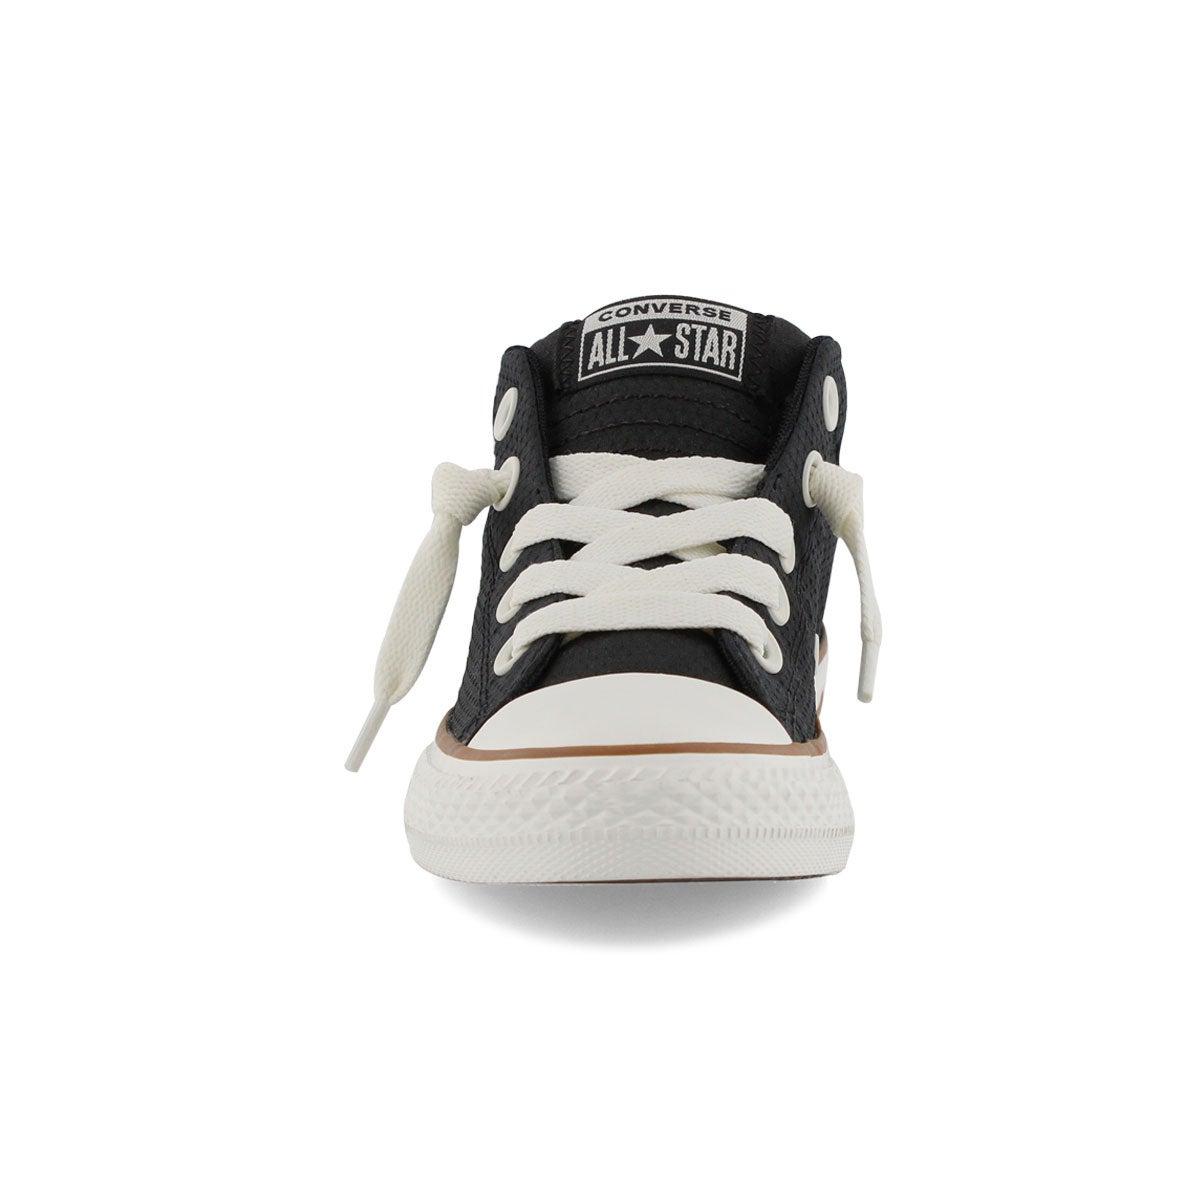 Bys CTAS Street Mid blk/gum sneaker